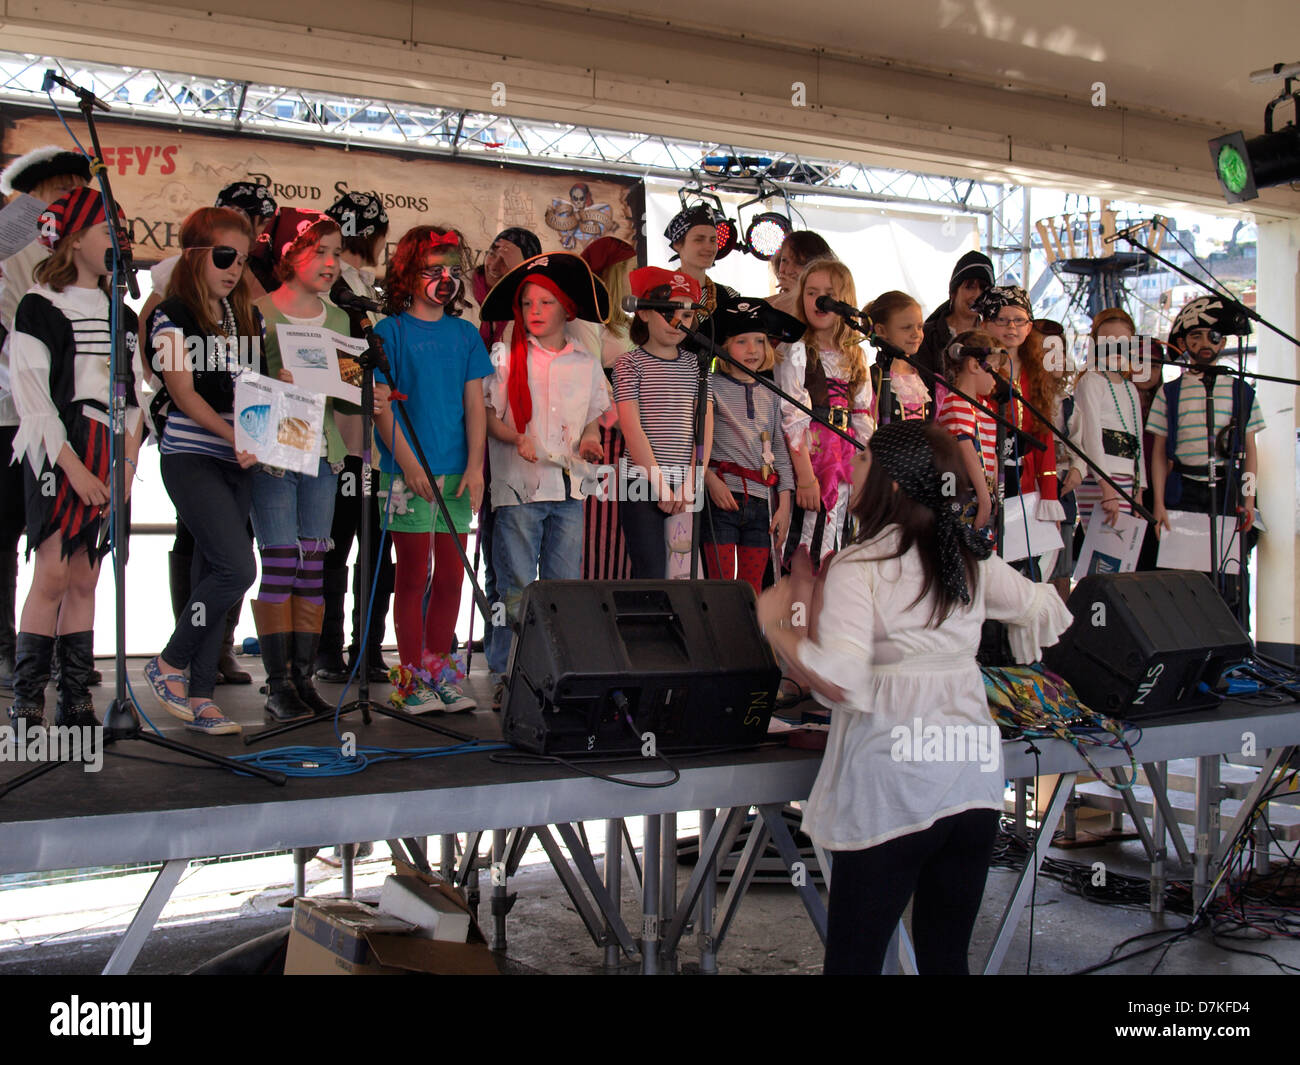 Local school children singing at the Brixham Pirate Festival